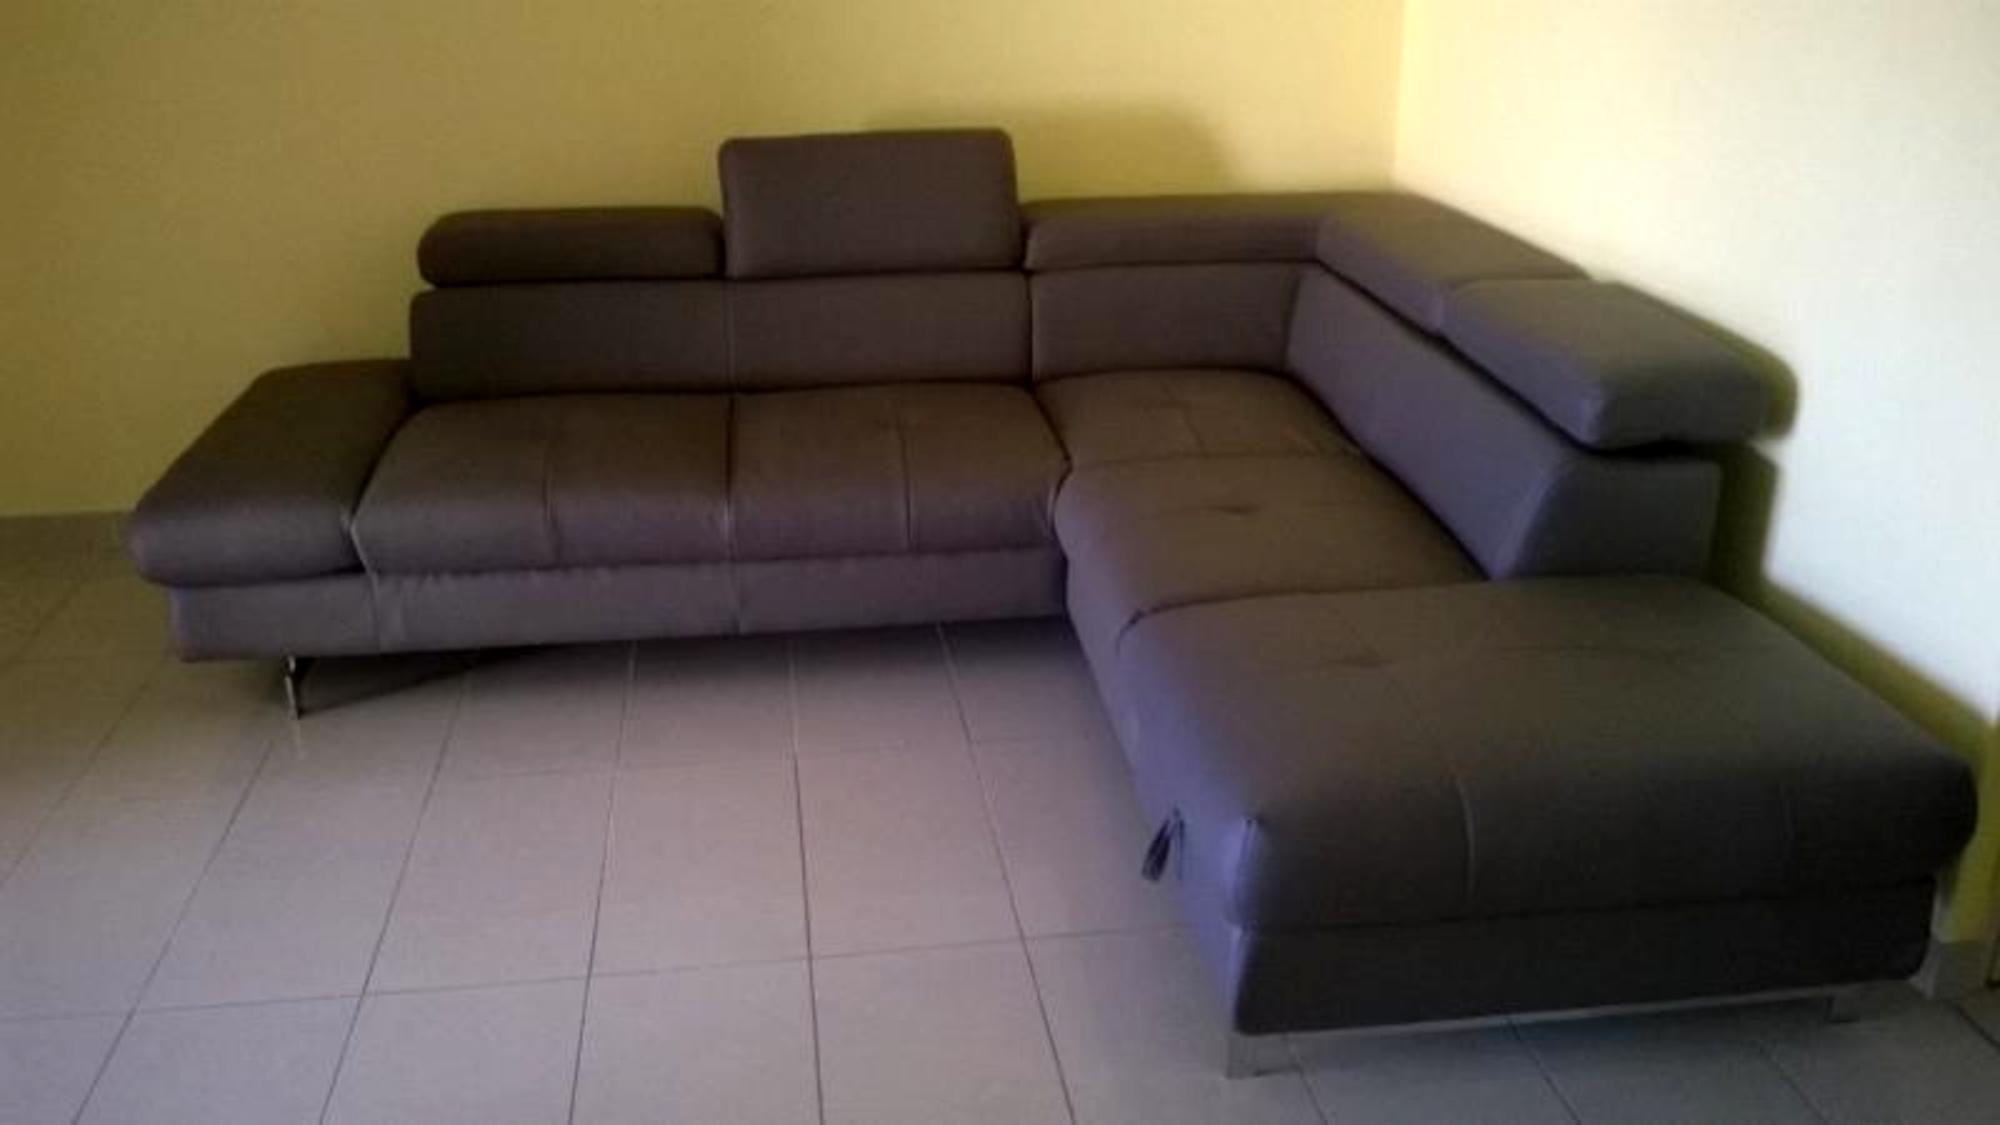 canap d 39 angle gauche autres mobiliers d 39 occasion aux ench res agorastore. Black Bedroom Furniture Sets. Home Design Ideas